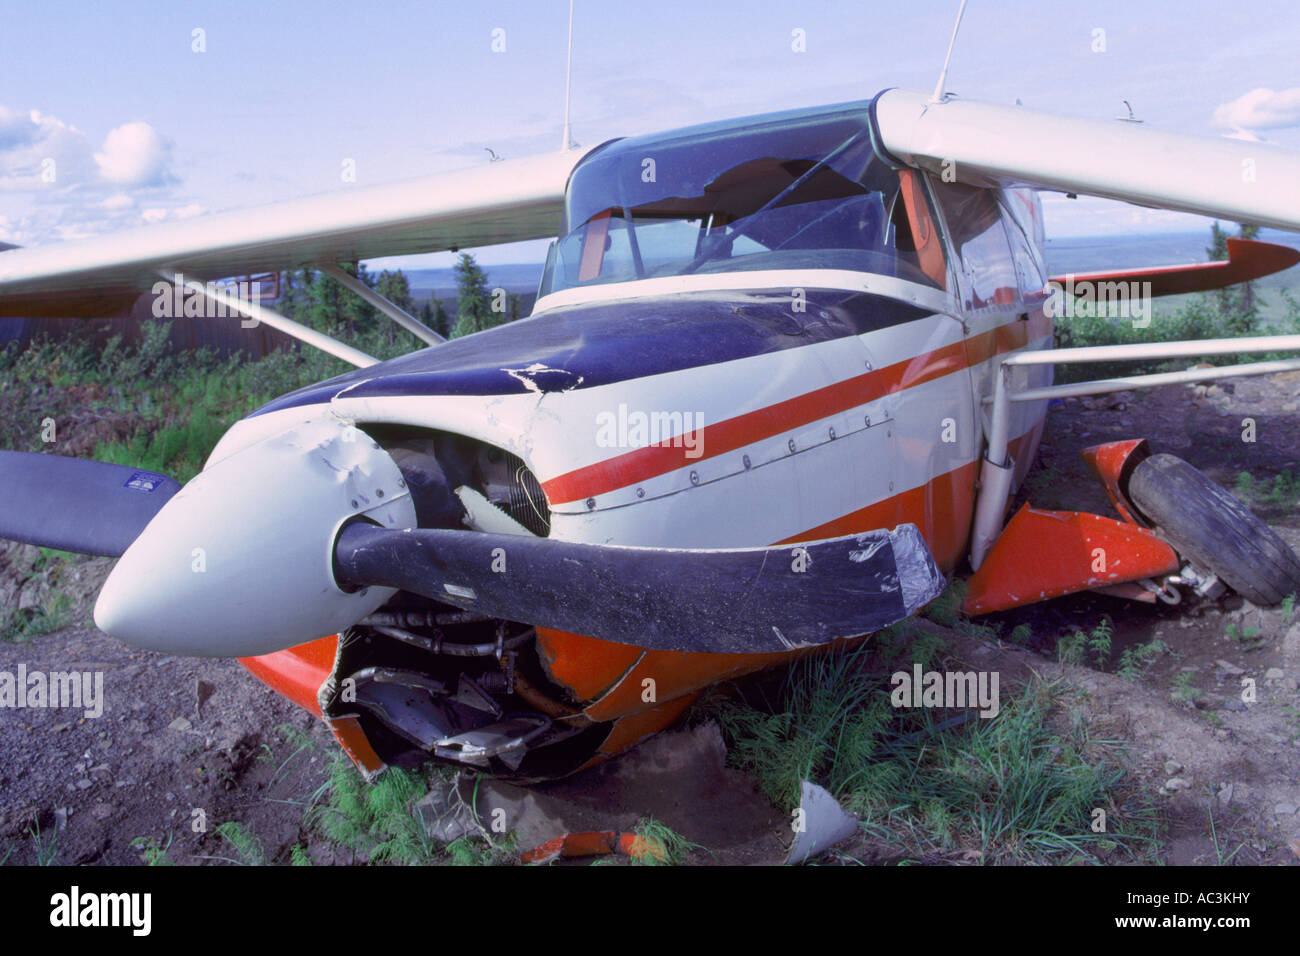 Fashion blogger plane accident